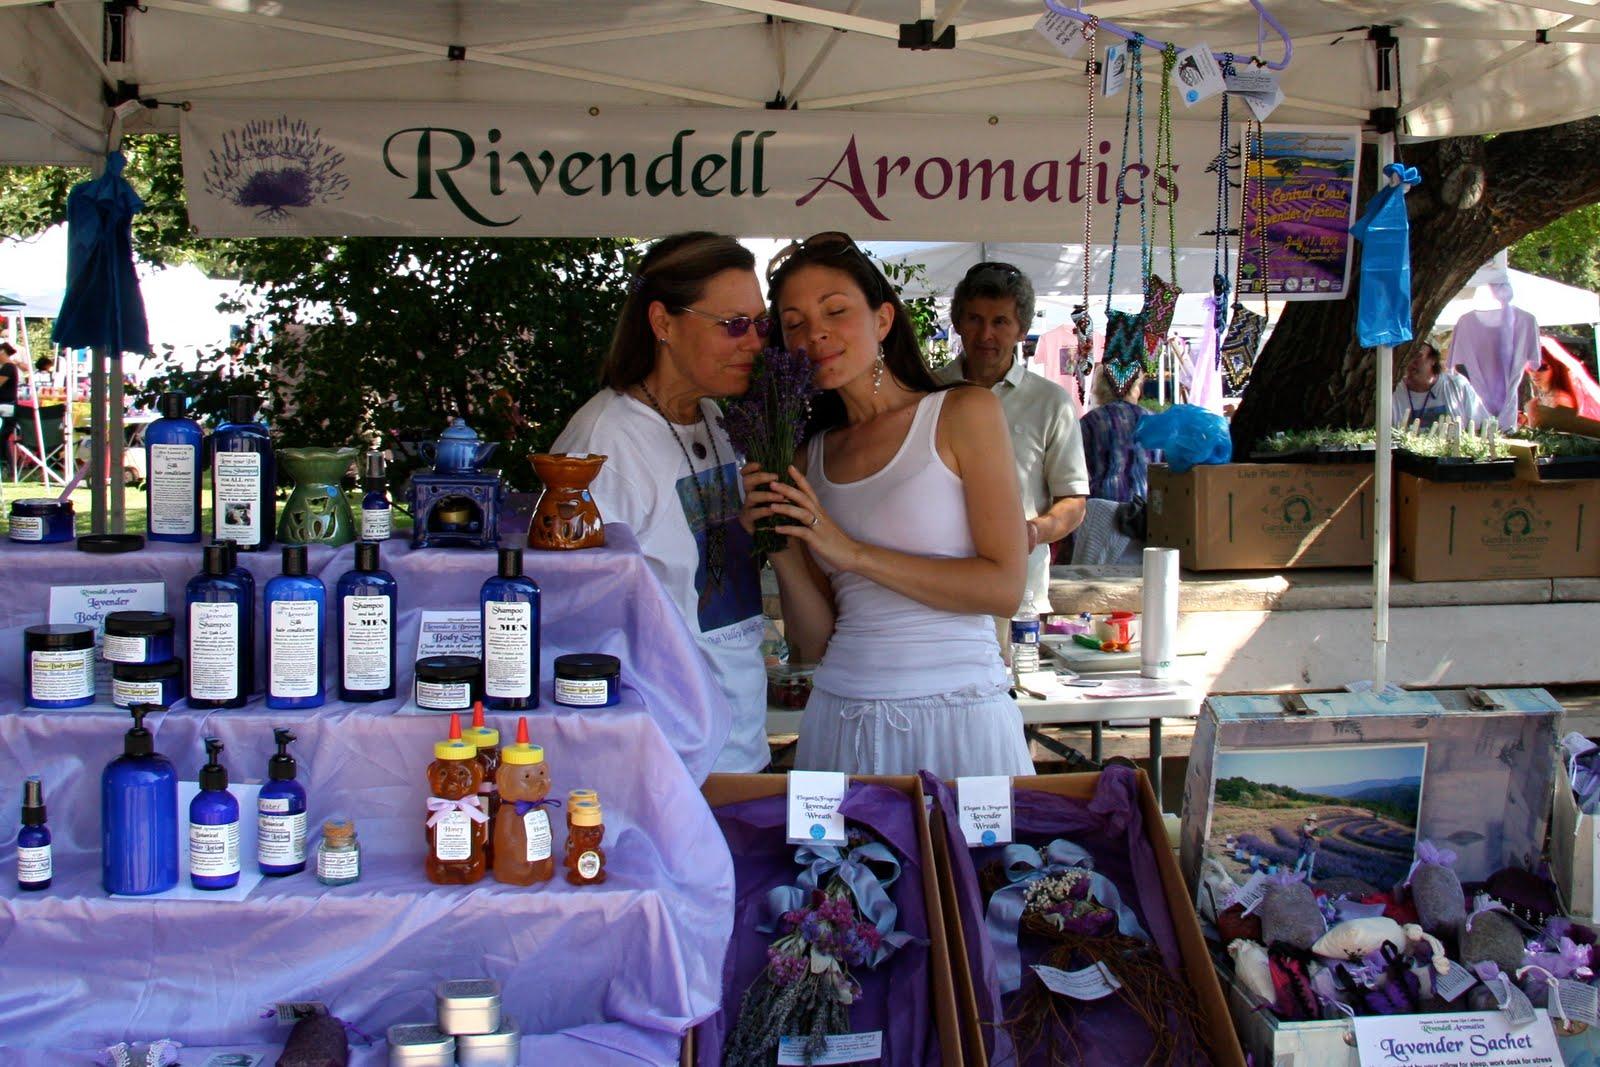 Hosting the Ojai Valley Lavender Festival 6/26/10, Rachel with associate